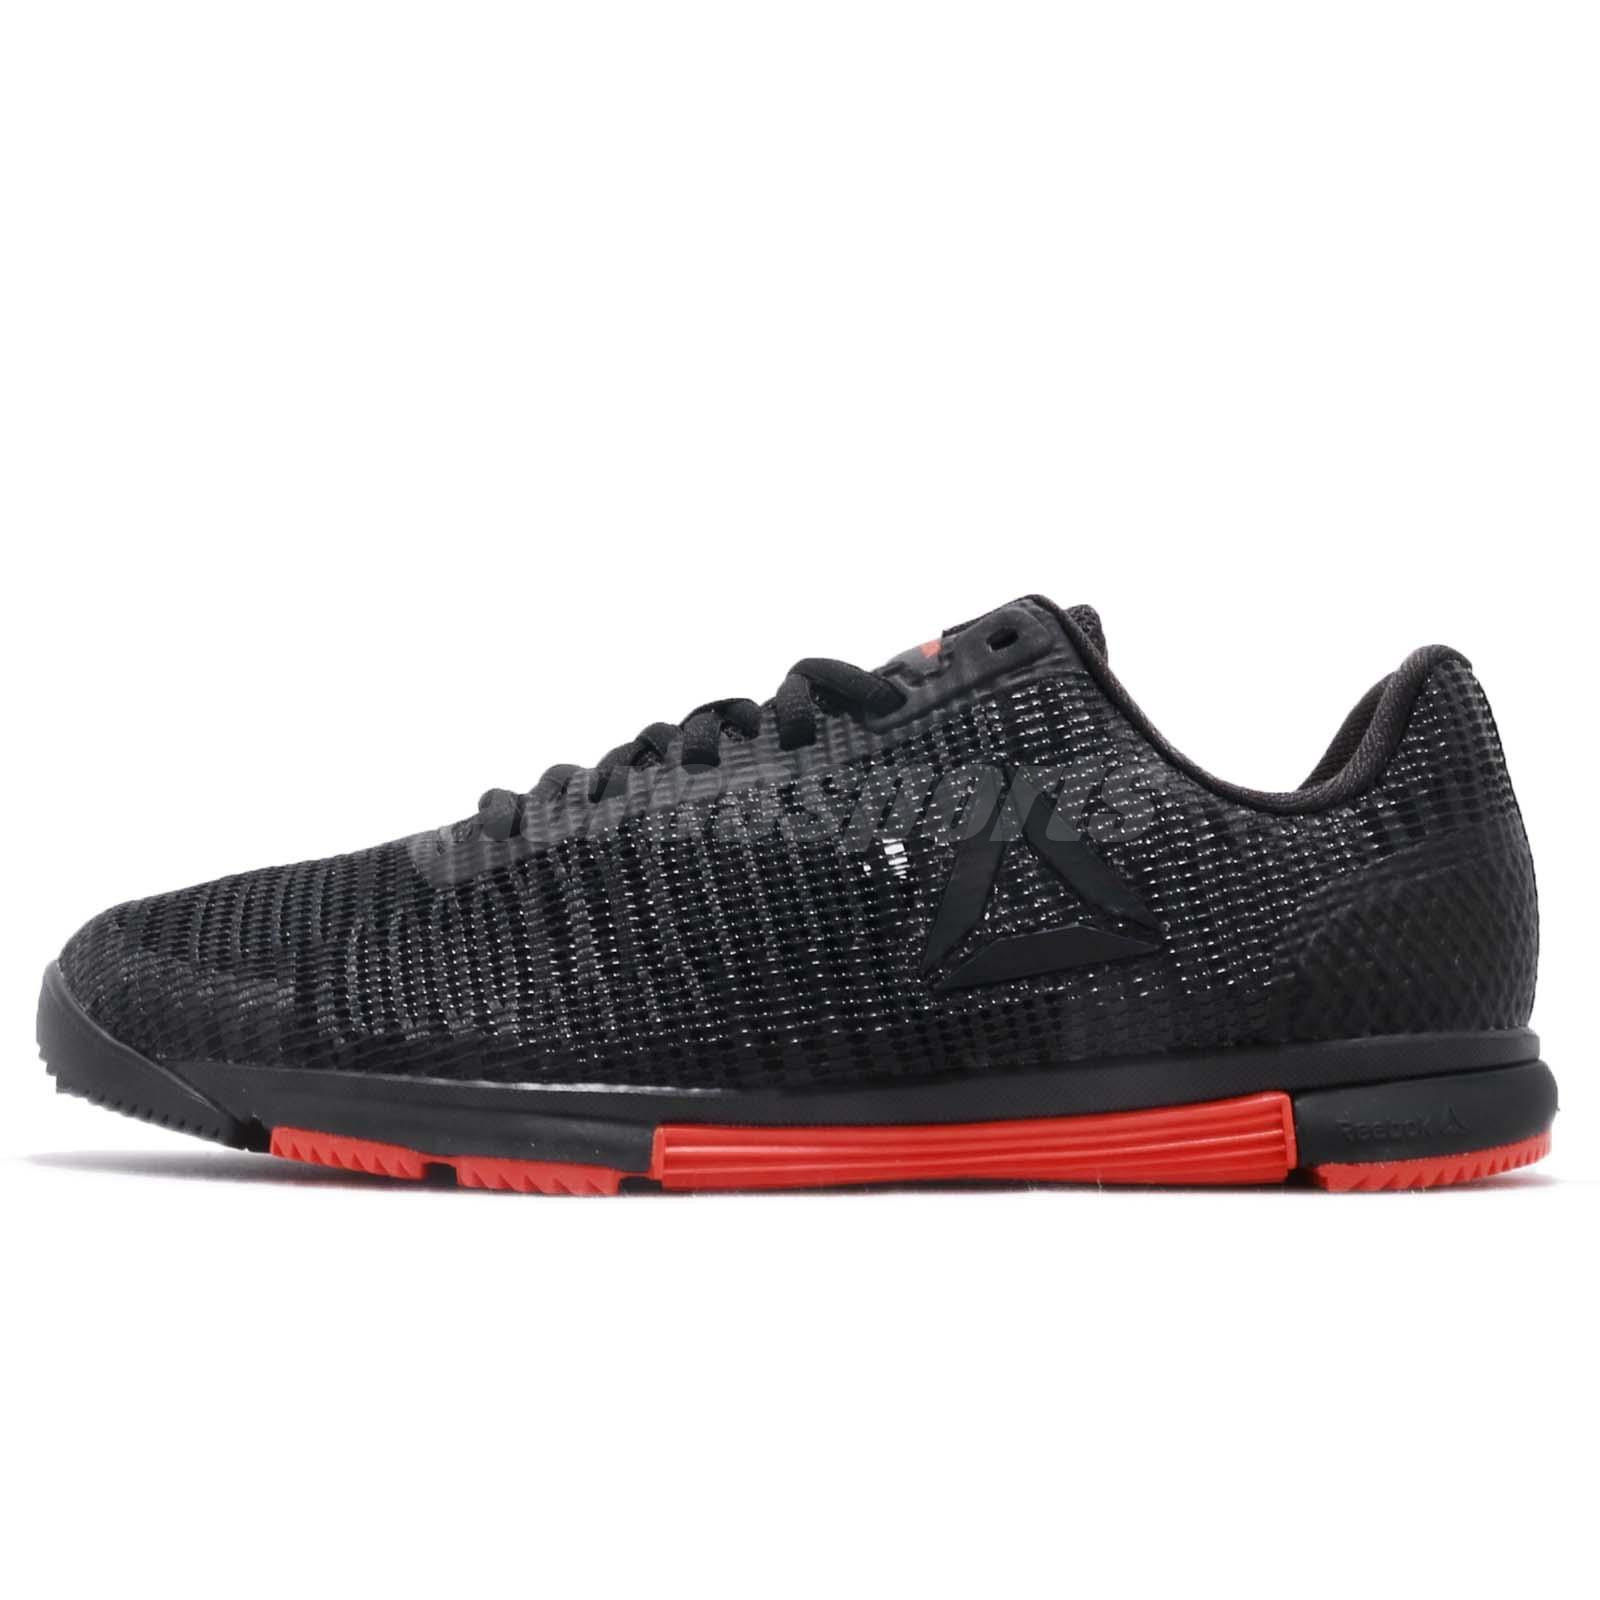 dc30b31f716 Reebok Speed TR Flexweave Black Carotene Women Cross Training Shoes CN5504